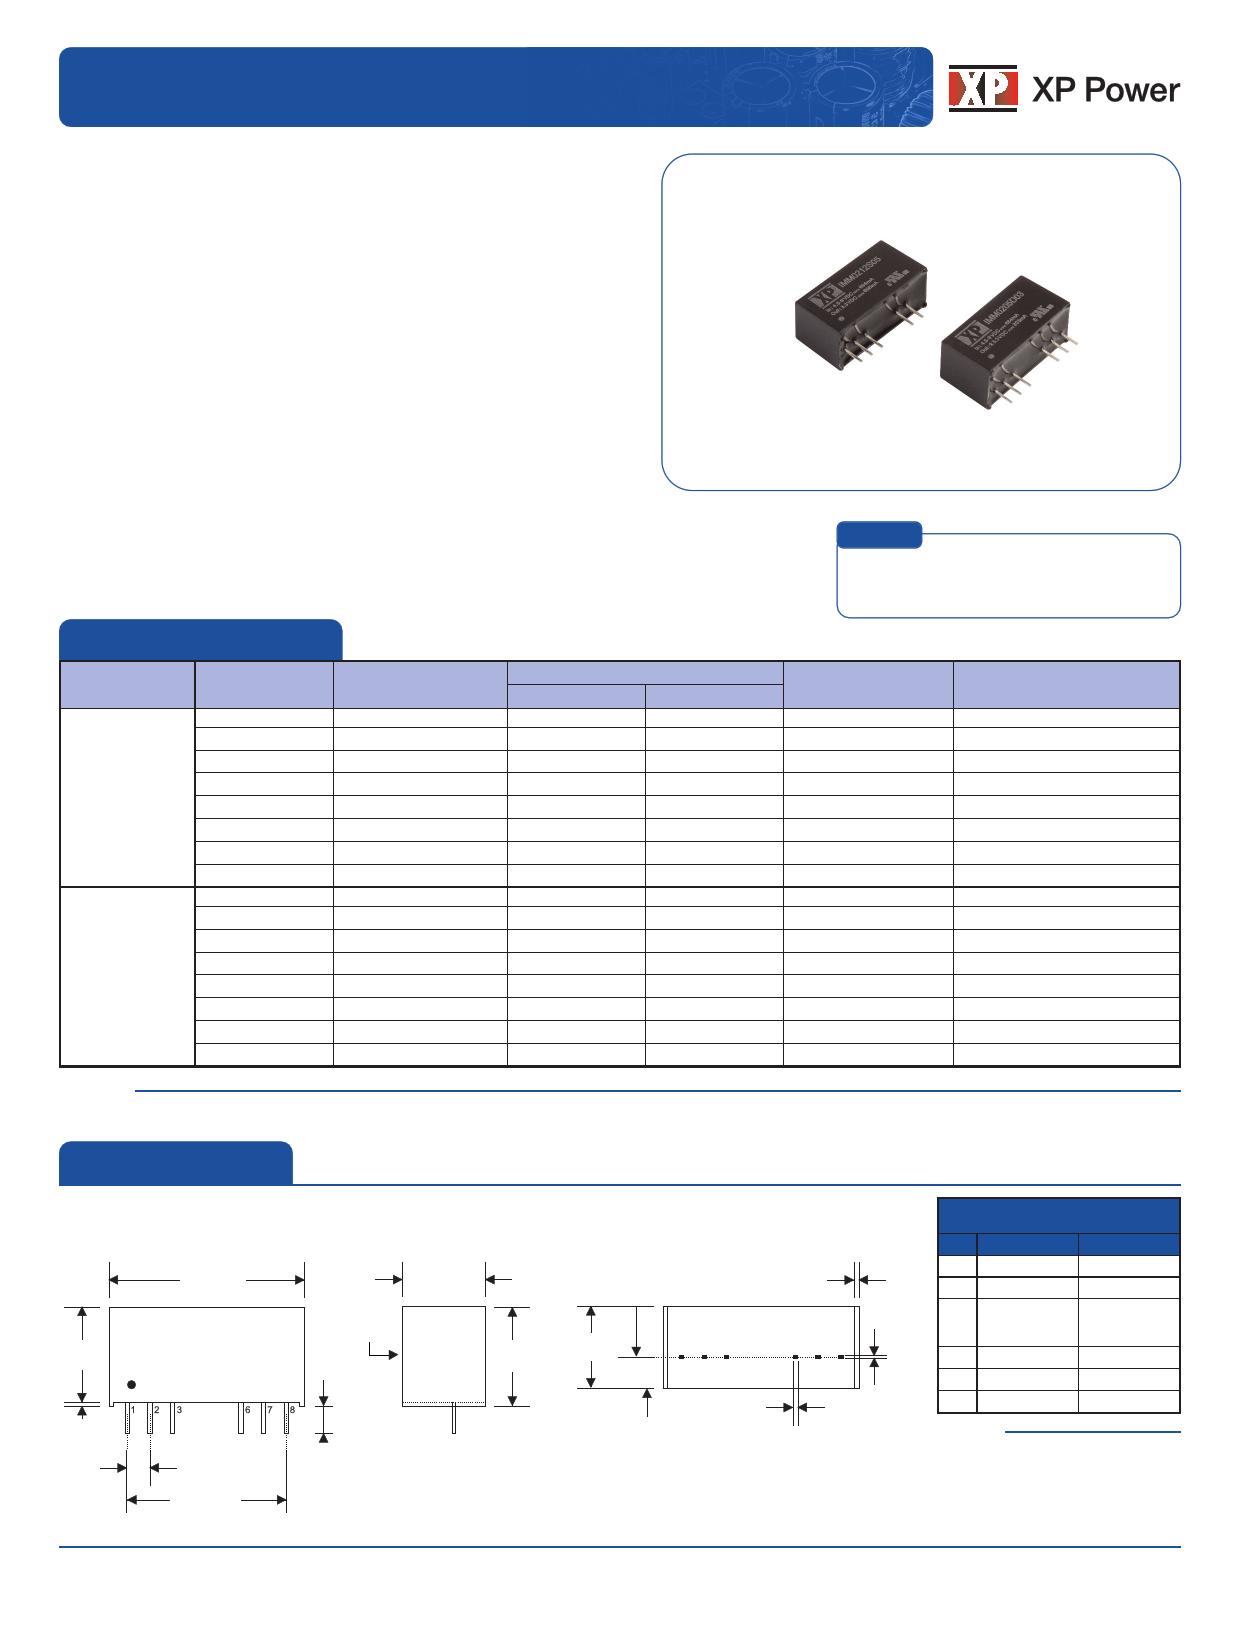 IMM0205S05 دیتاشیت PDF